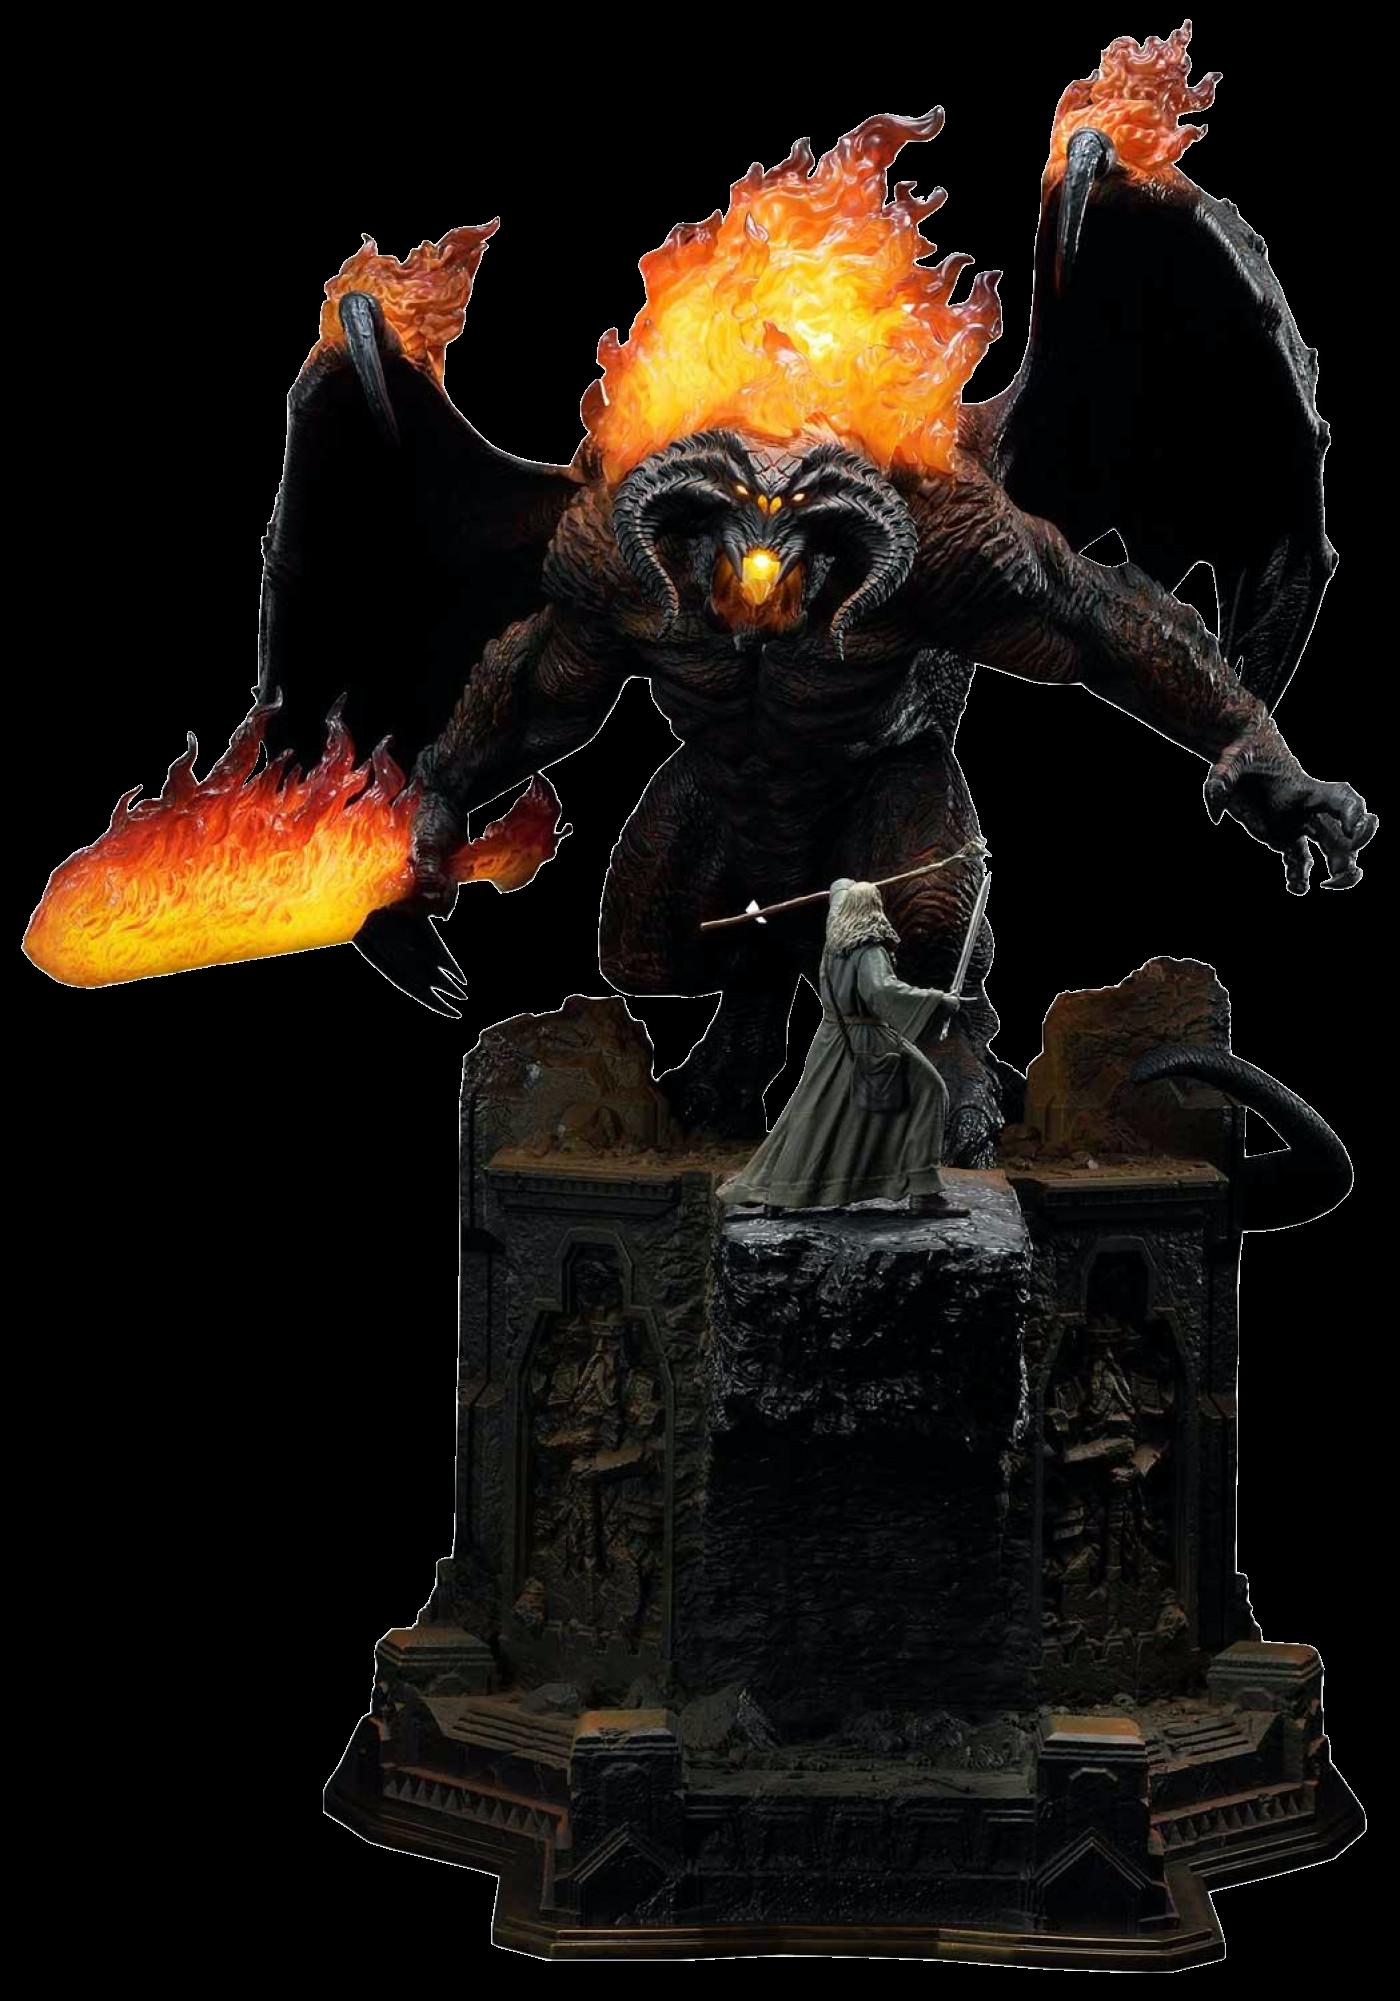 prime1-studio-the-lord-of-the-rings-gandalf-vs-balrog-statue-toyslife